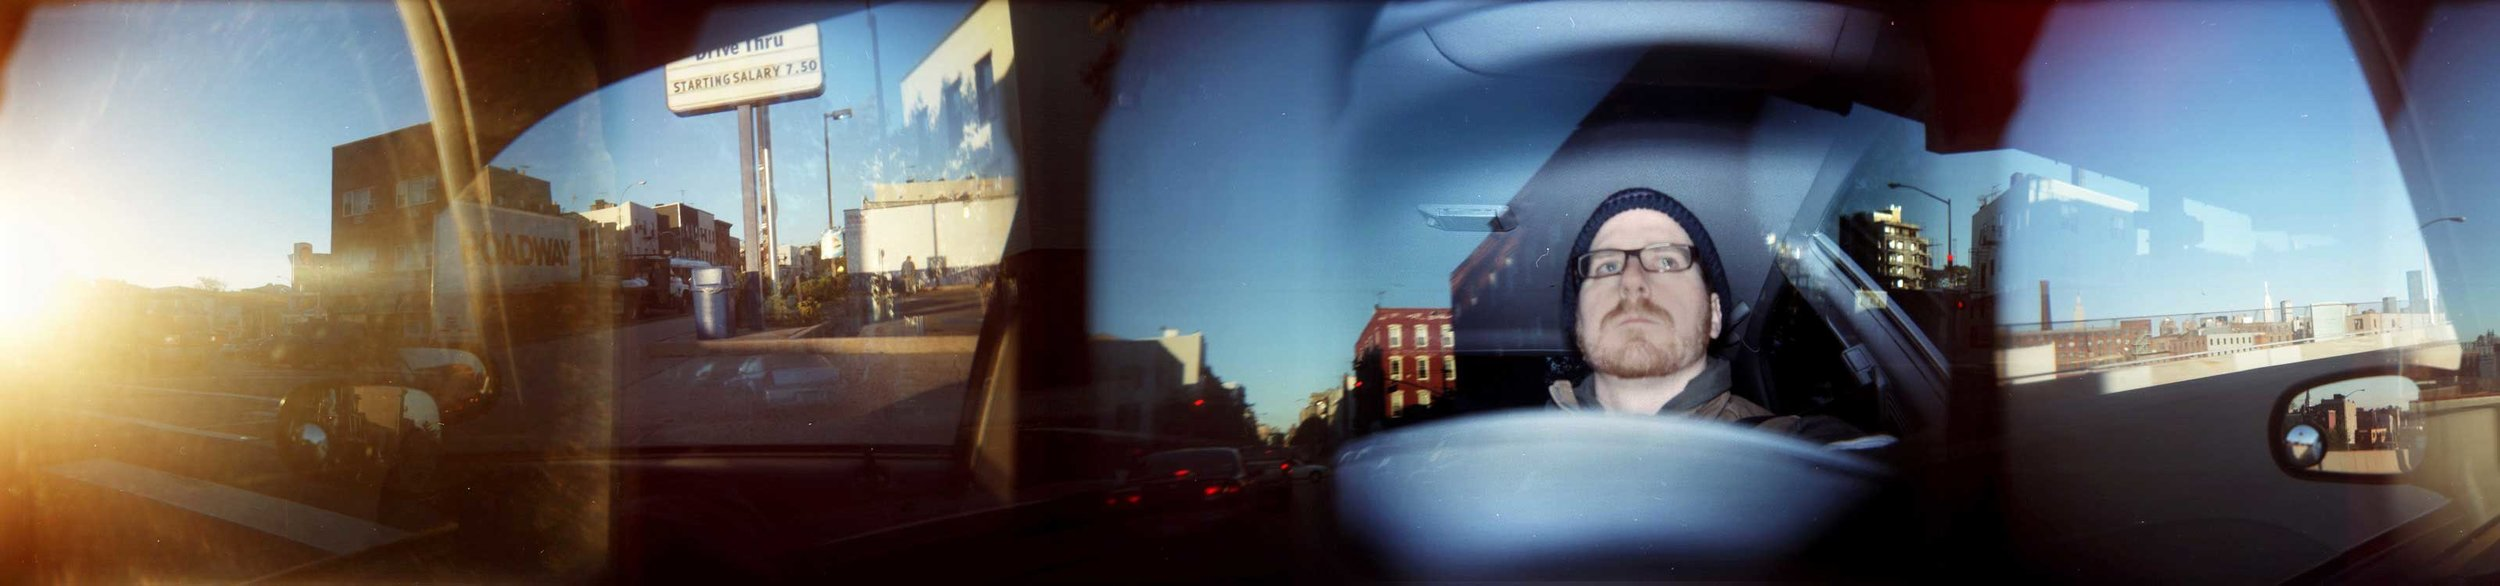 Driving_4.jpg